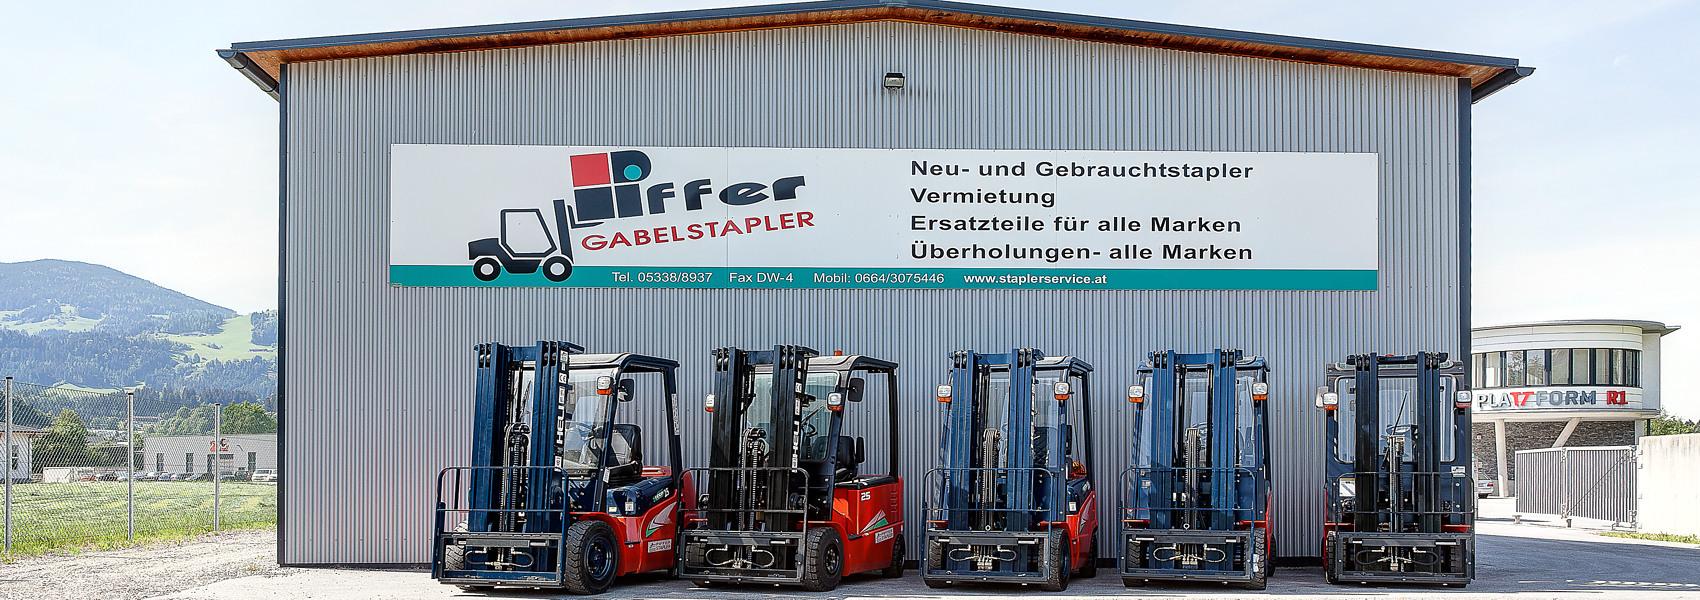 Ludwig Piffer GmbH